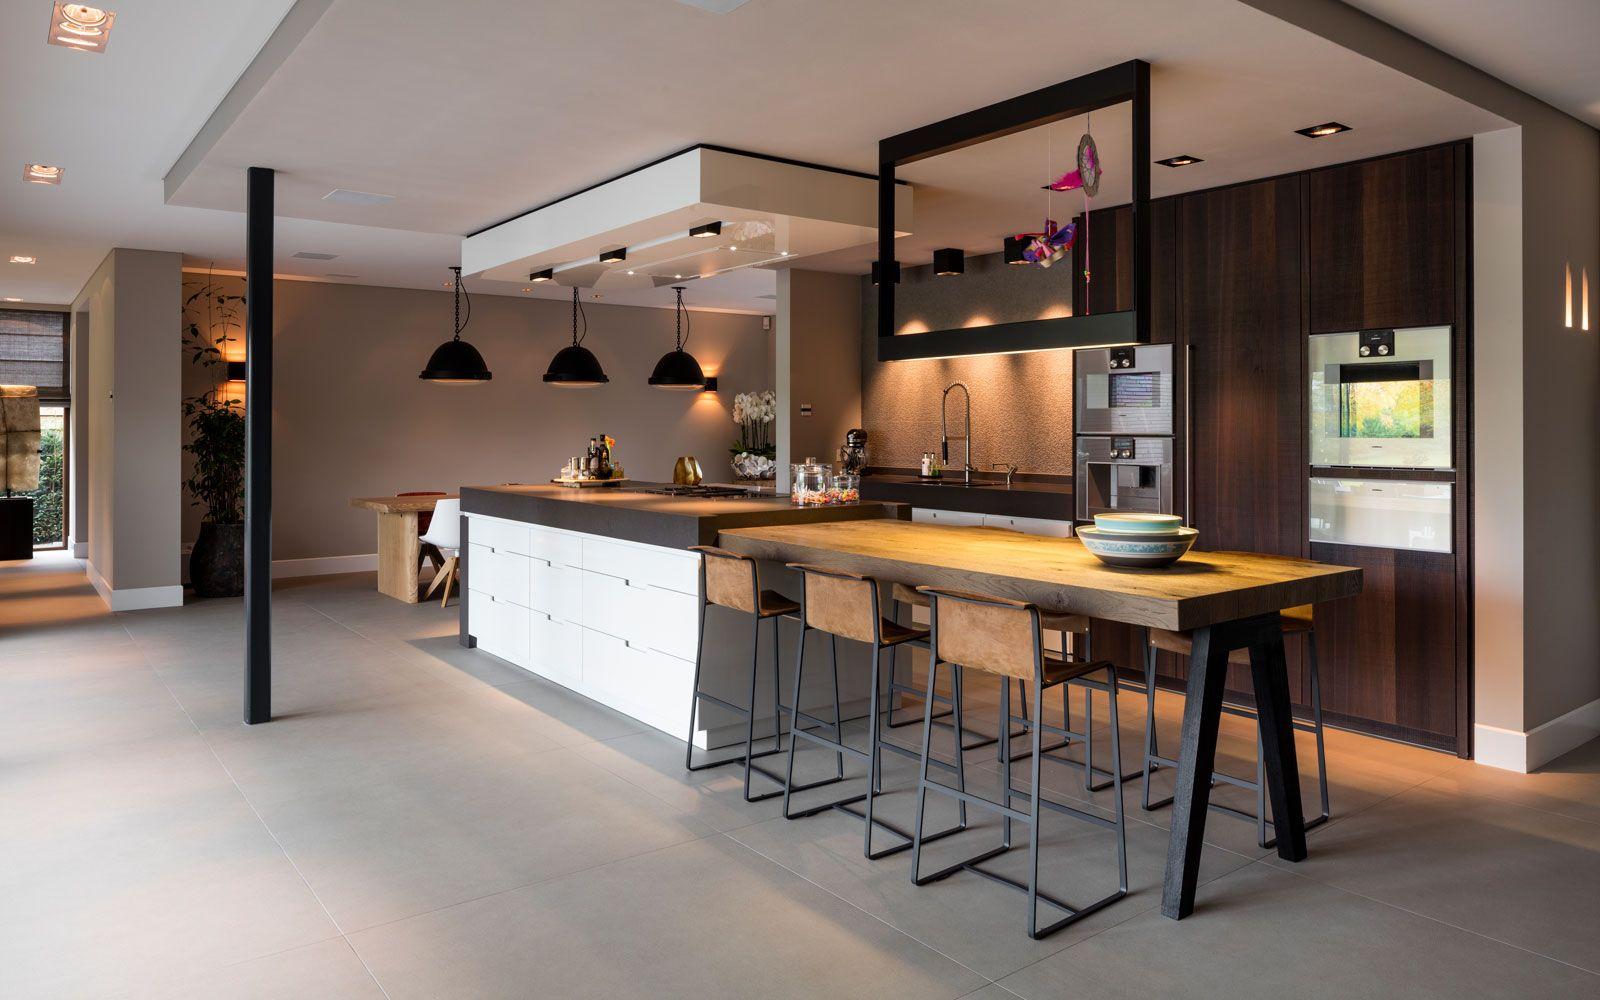 Moderne Villa Francois Hannes Moderne Keuken Keuken Ontwerpen Keuken Ontwerp